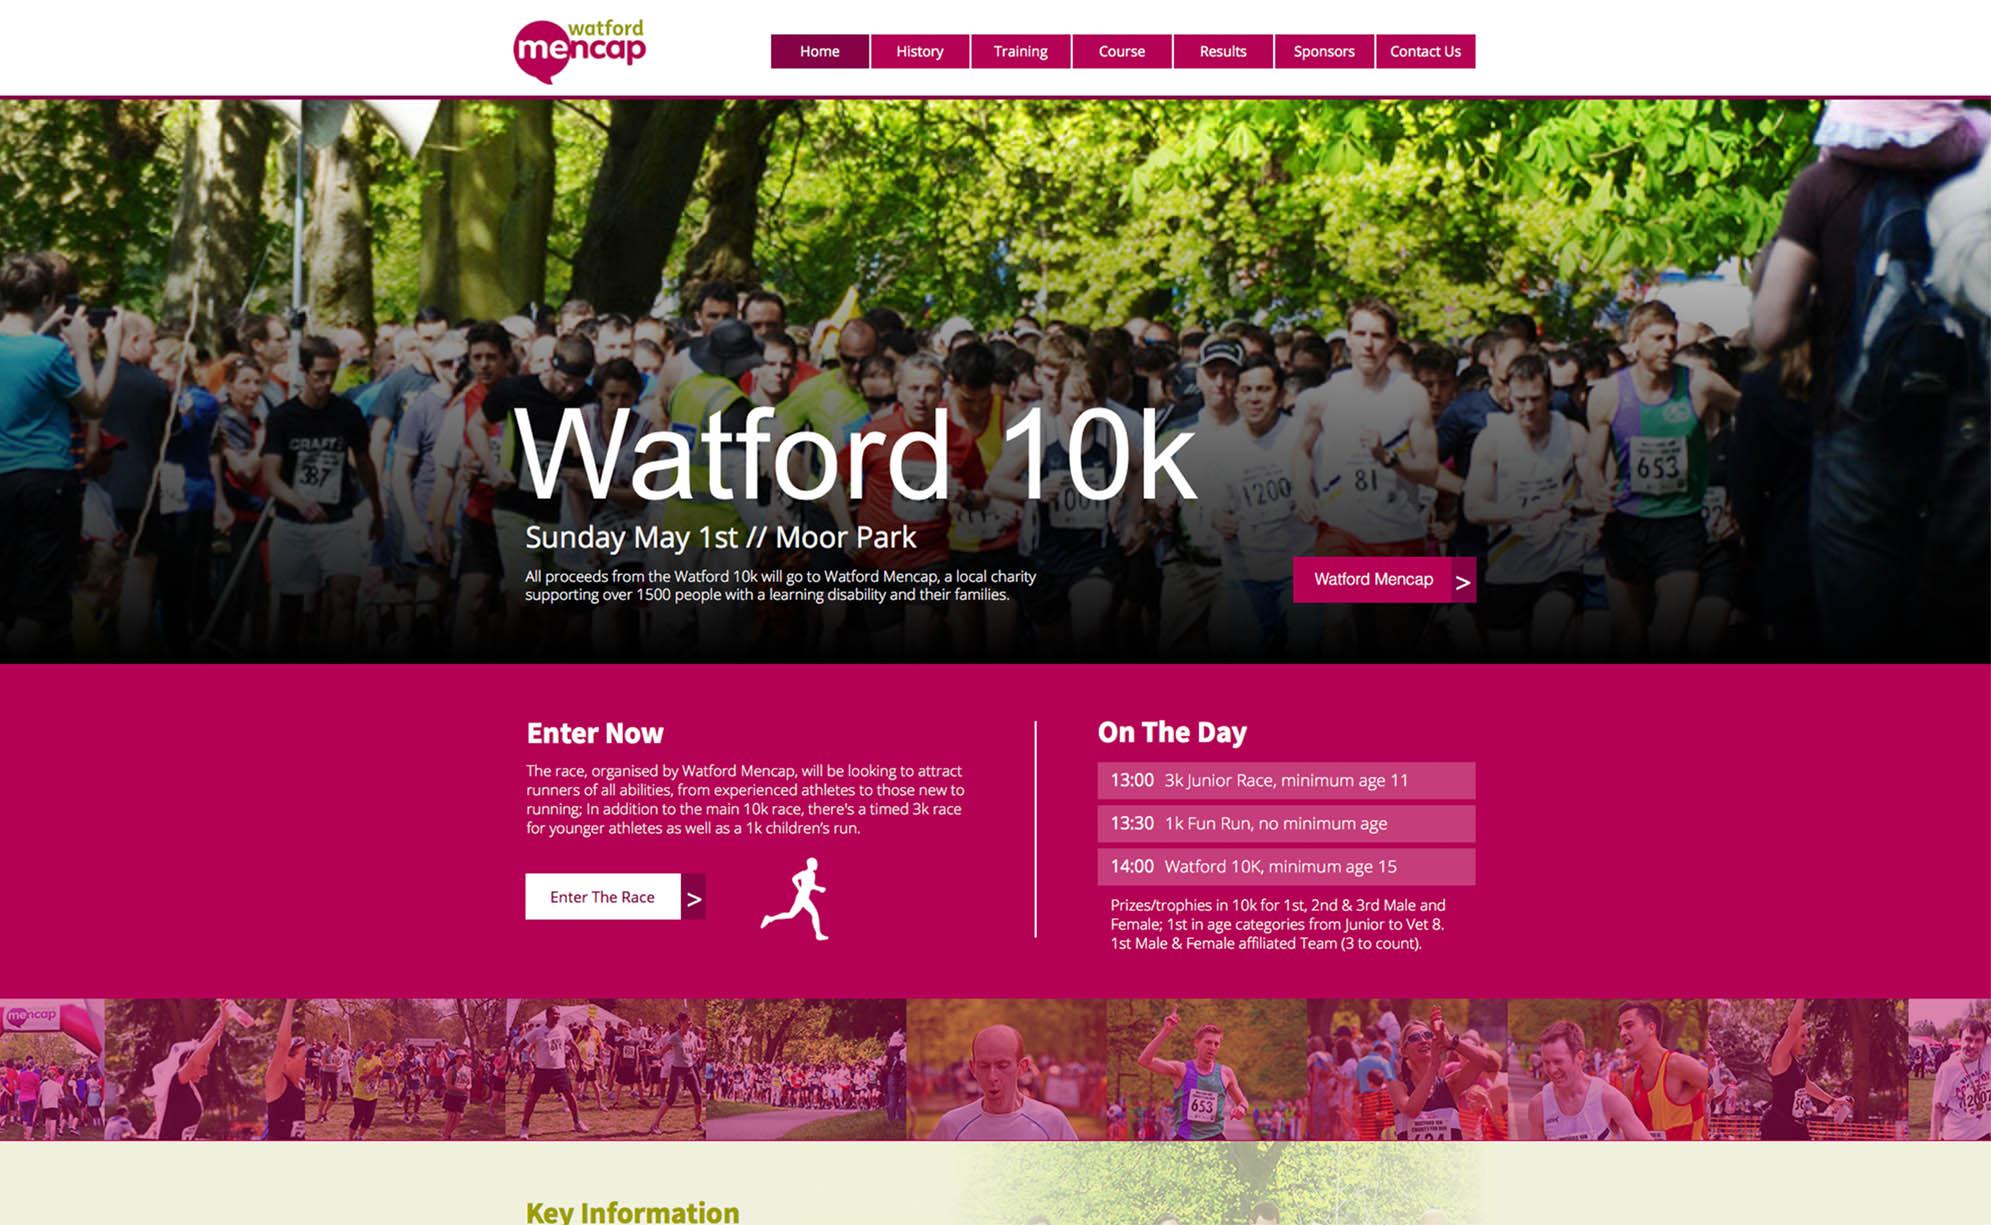 Watford-10k-website